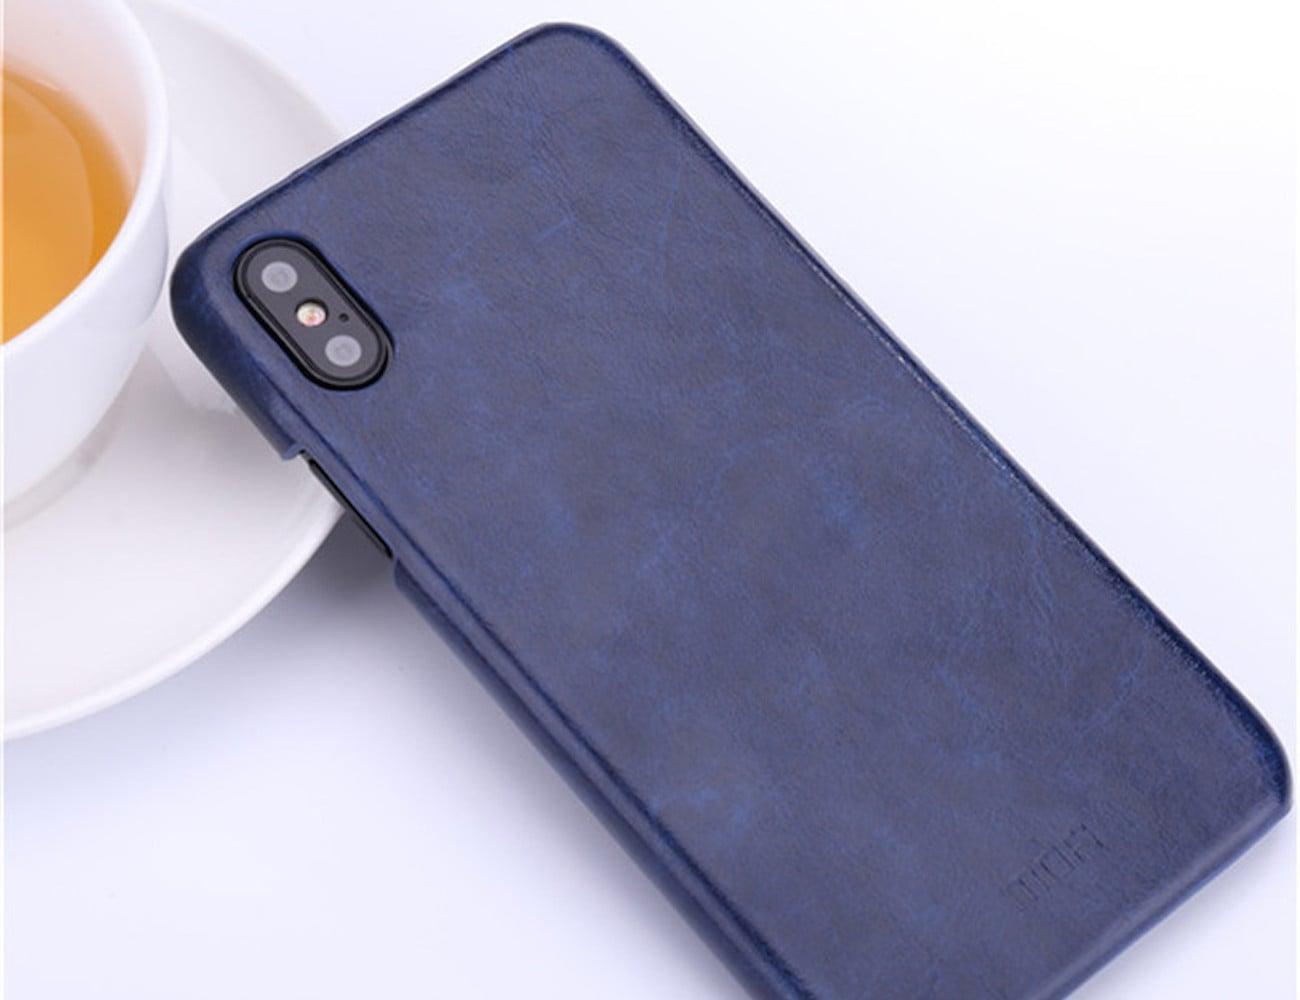 Iphonex Phone Cases: Luxury PU Leather IPhone X Case » Gadget Flow